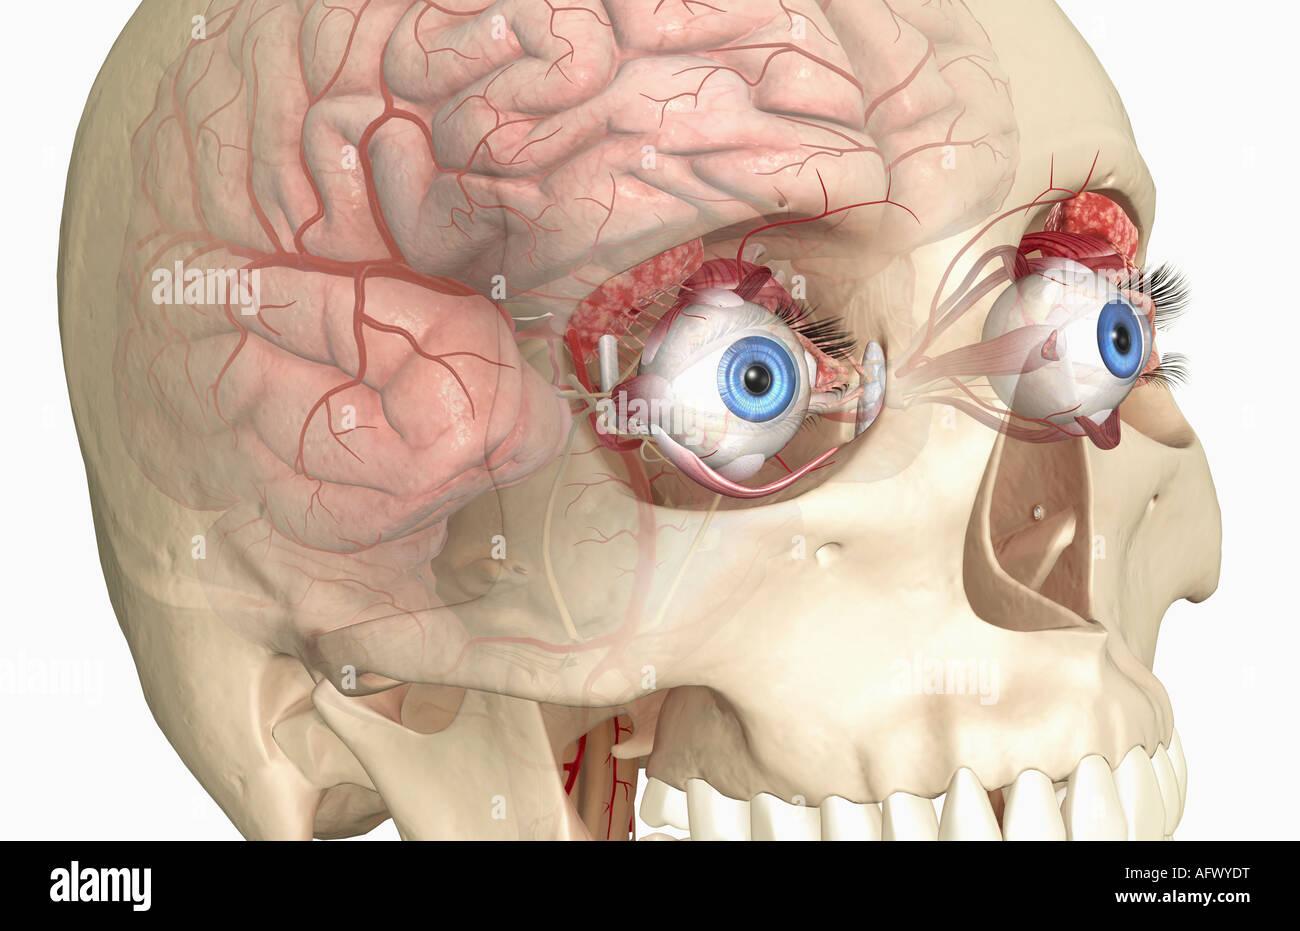 The lacrimal apparatus Stock Photo: 14030291 - Alamy